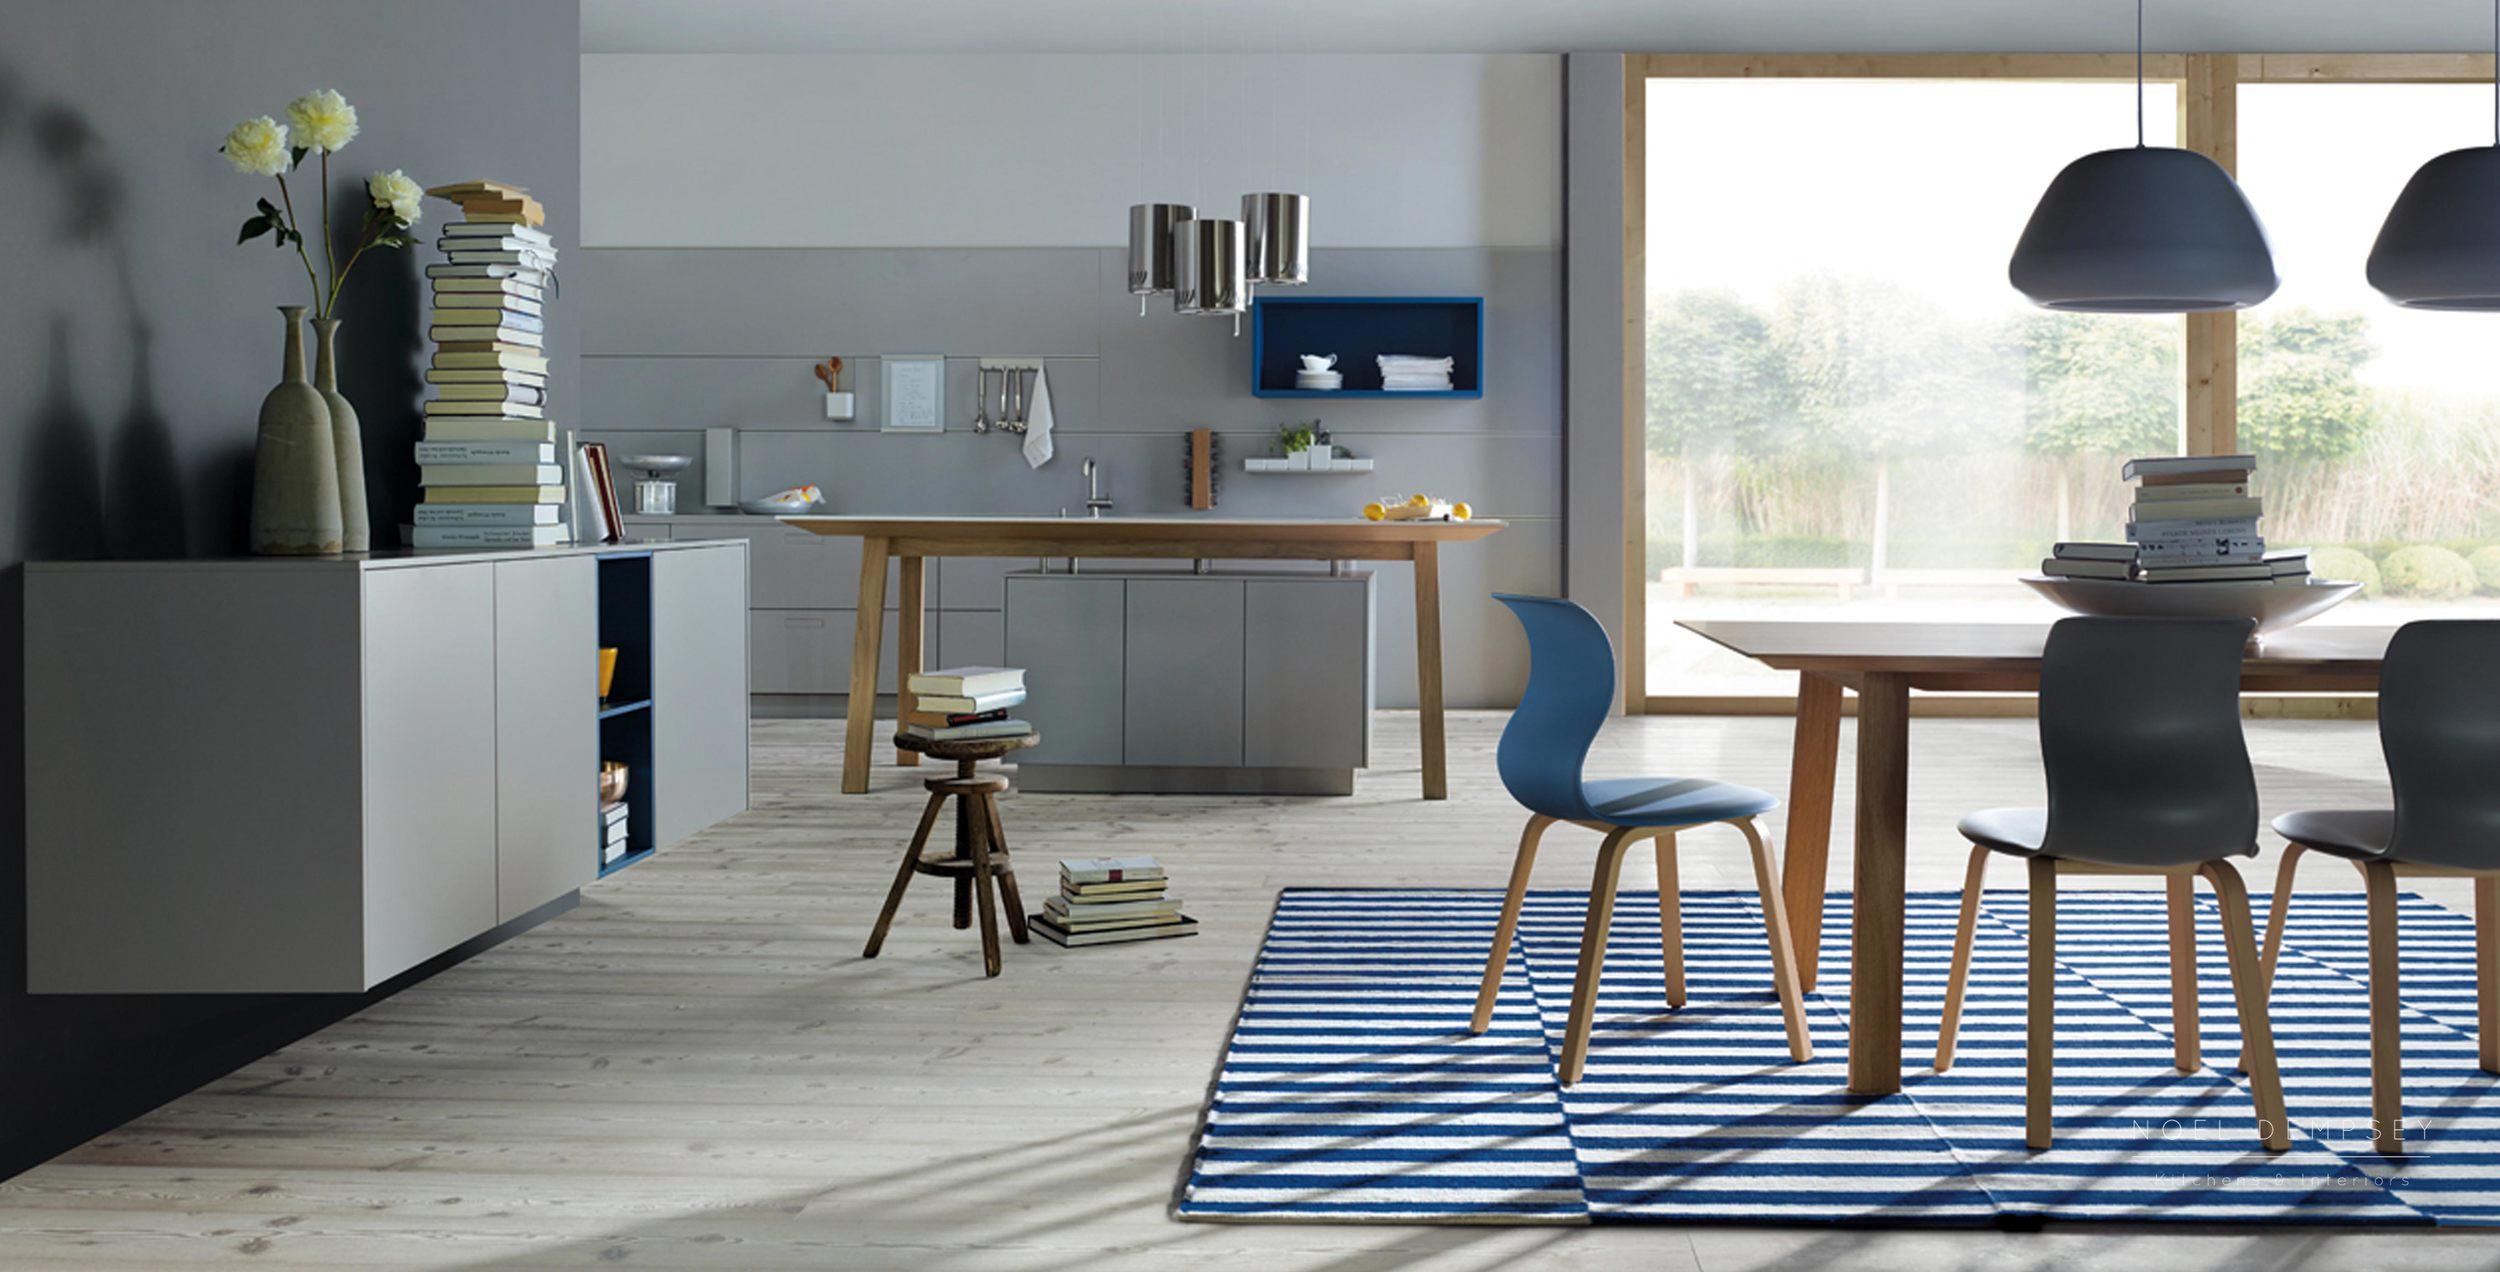 NX800-Stone-Grey-German-Kitchen-2.jpg